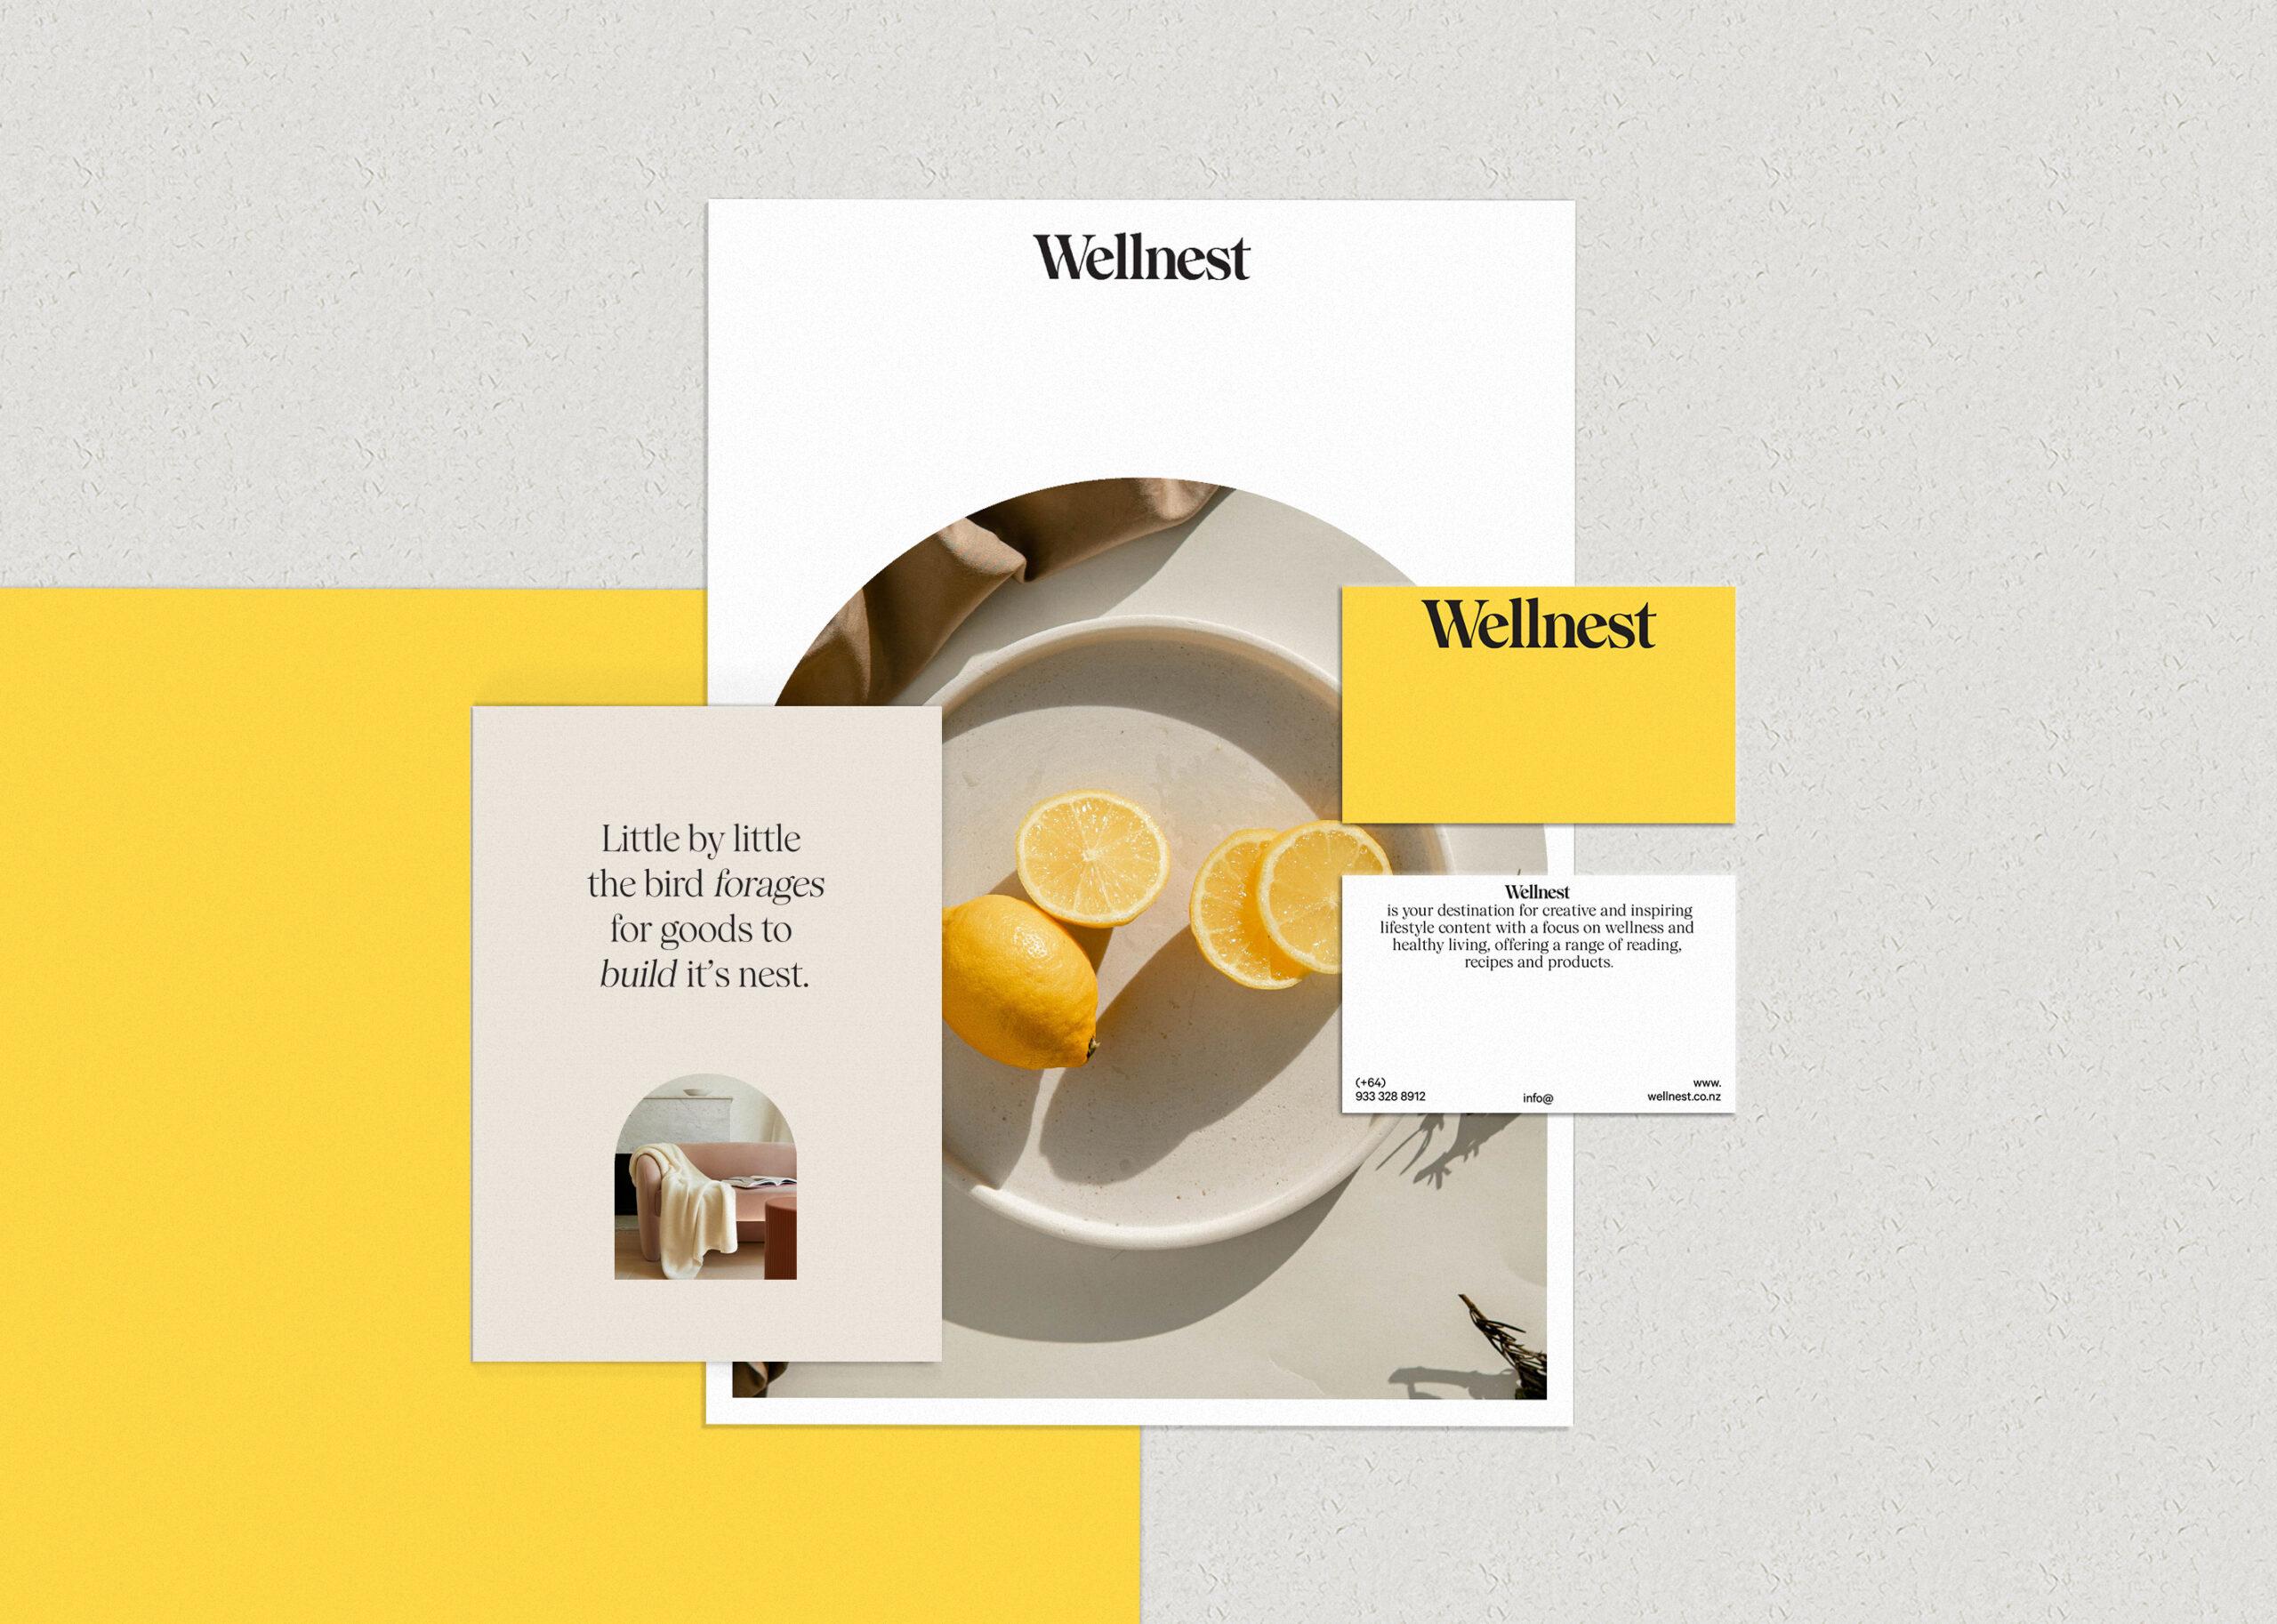 SCC_Wellnest_Stationary_01